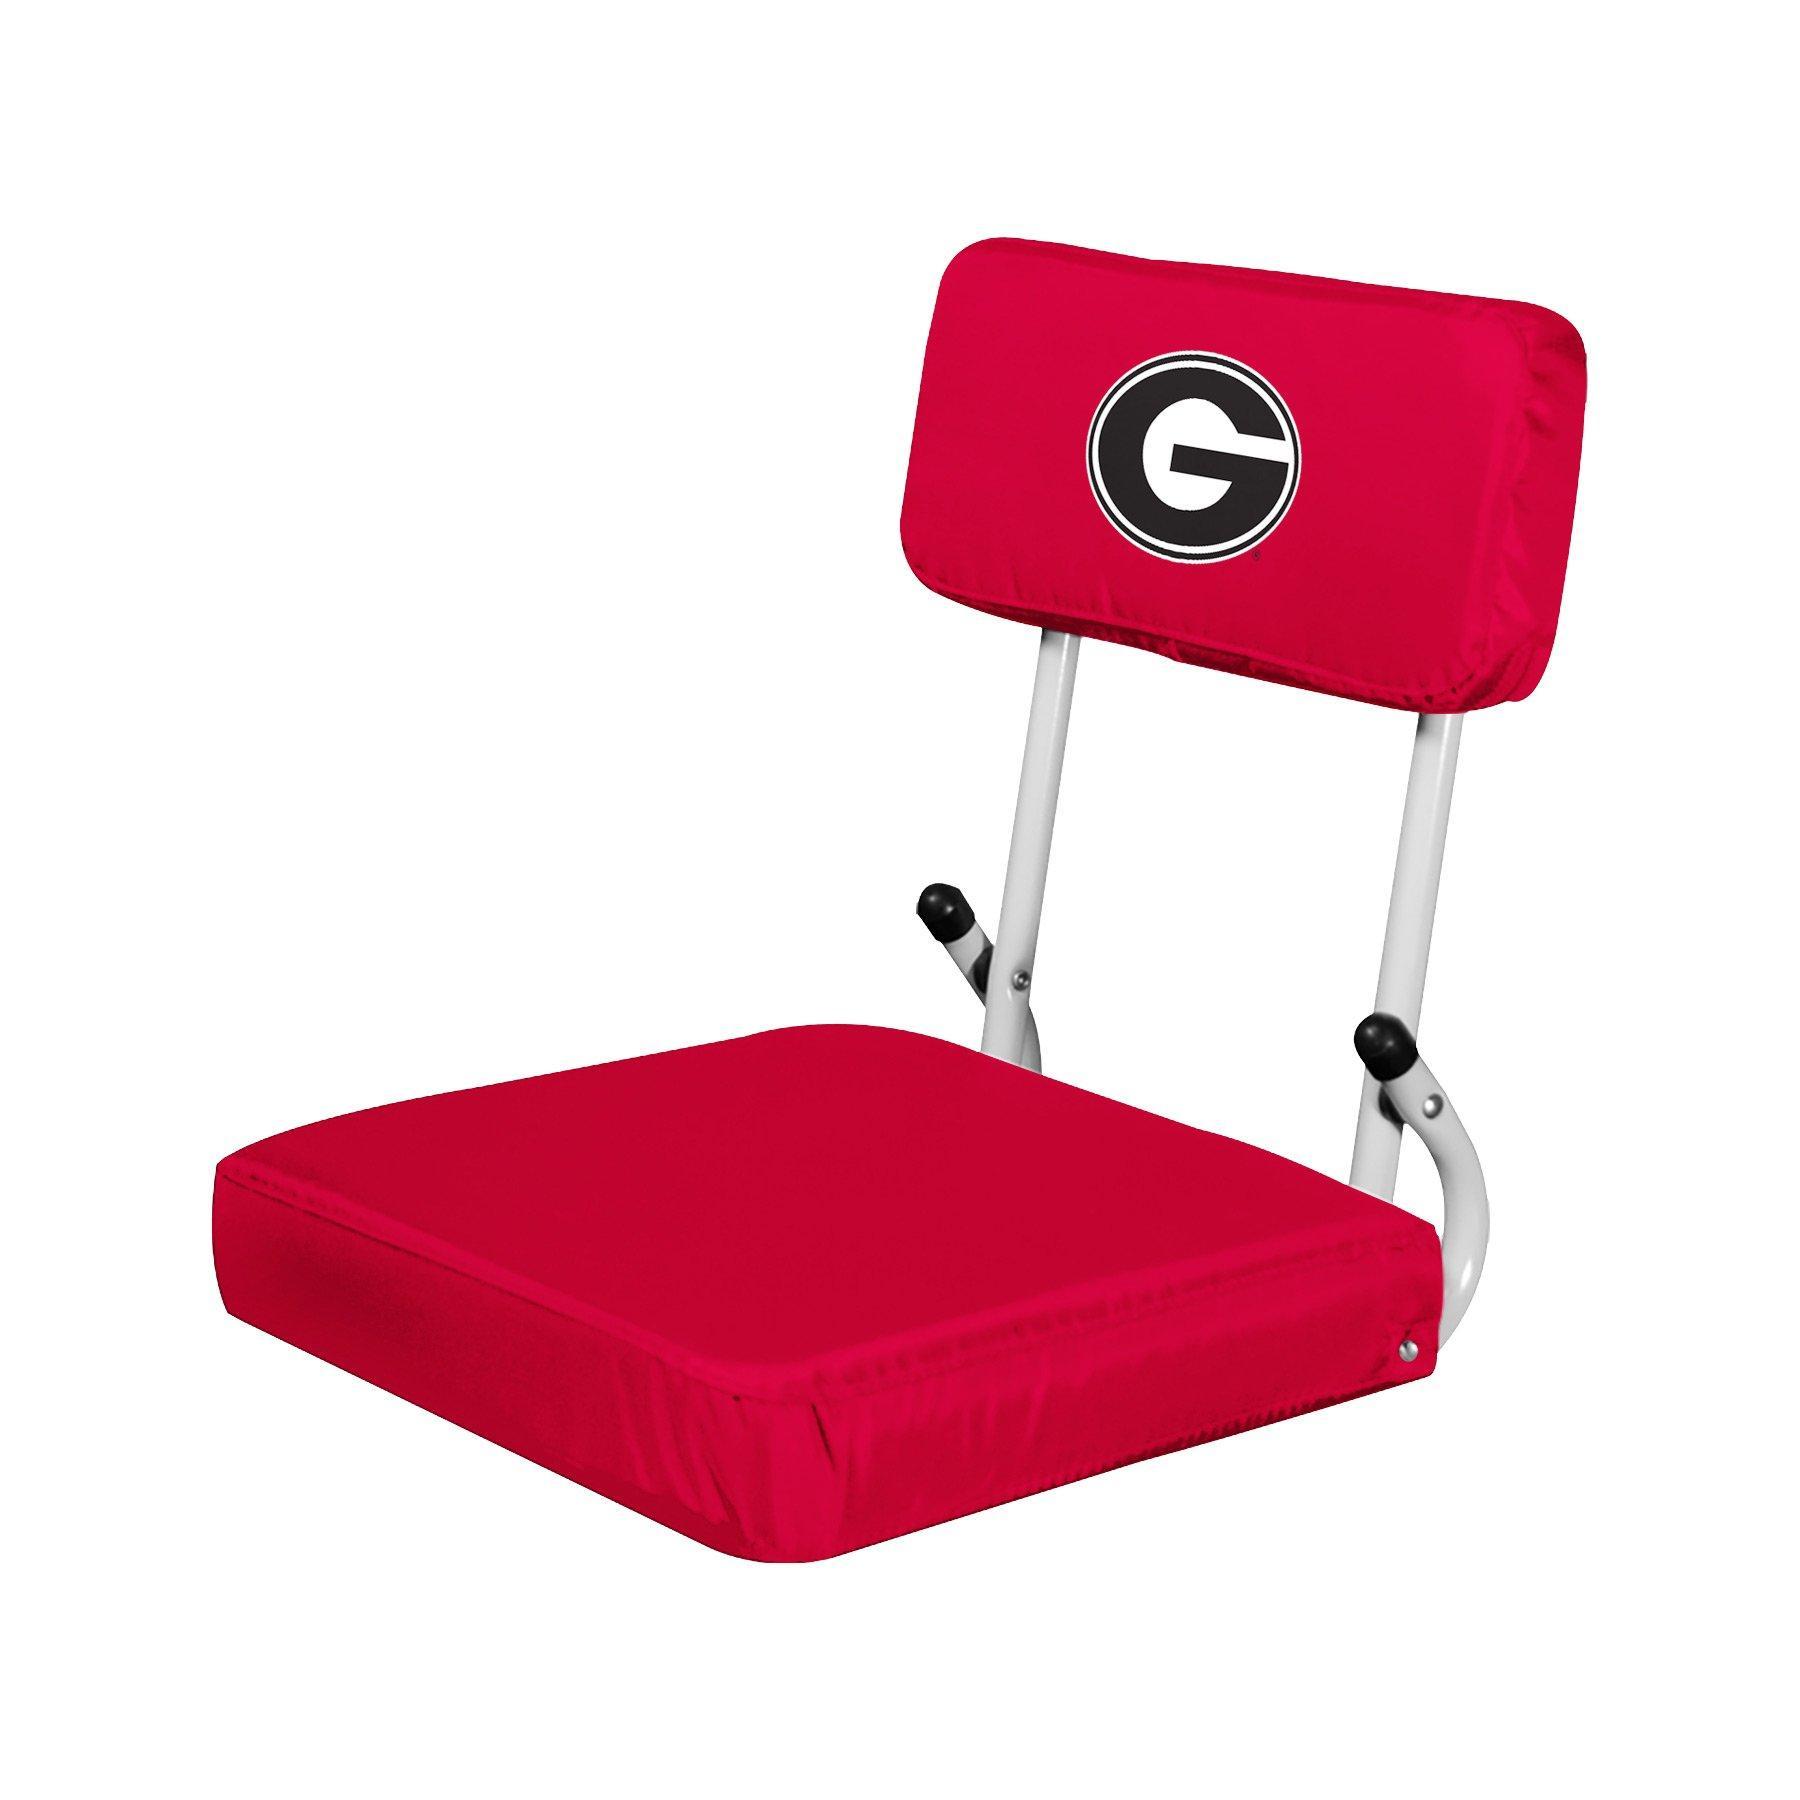 georgia chair company swivel new zealand logo bulldogs hardback stadium seat hibbett us main container image 1